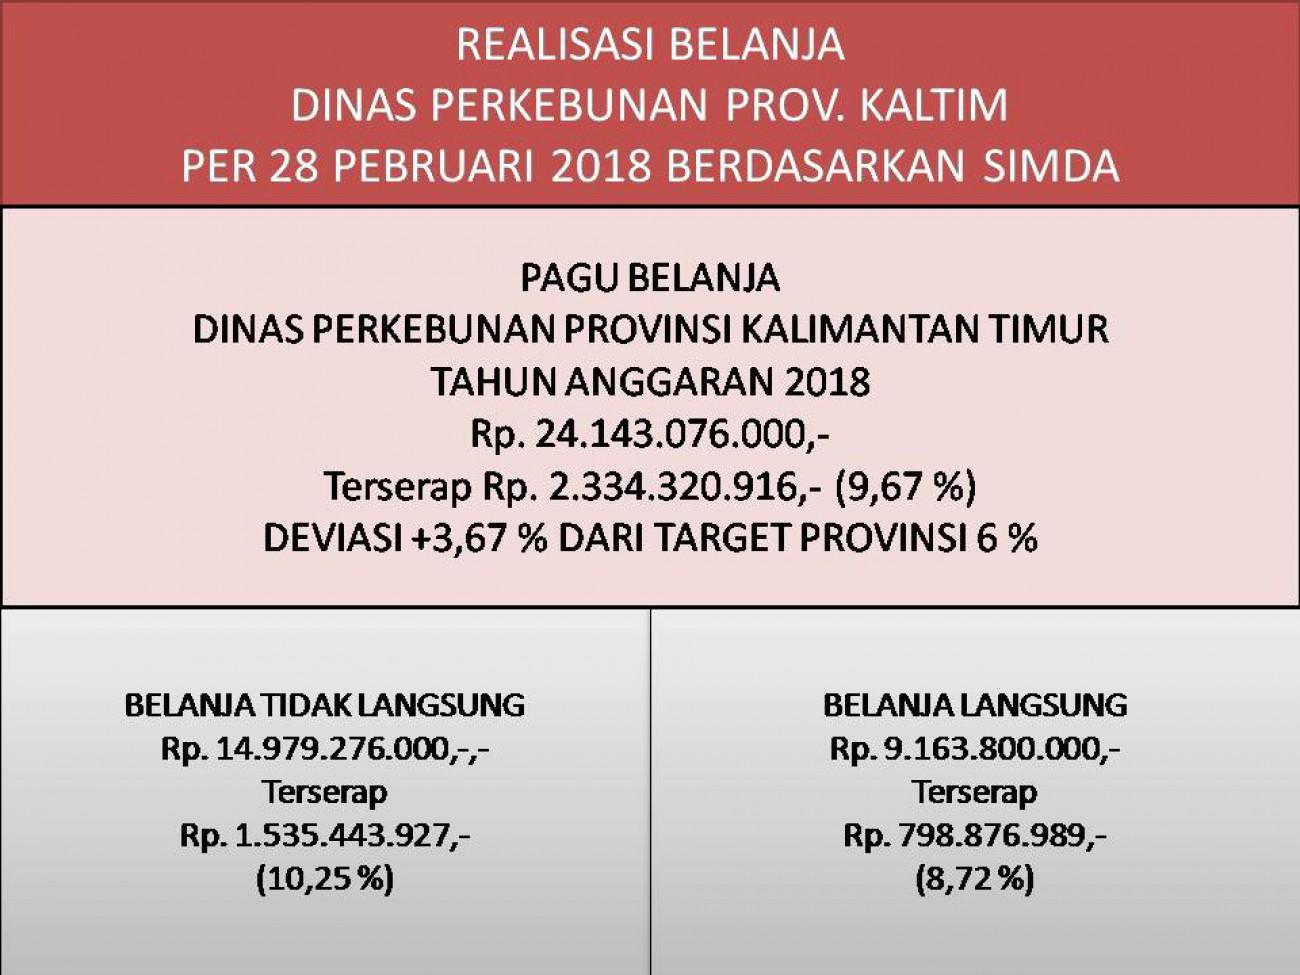 Laporan Realisasi APBD Dinas Perkebunan Prov. Kaltim Bulan Februari 2018